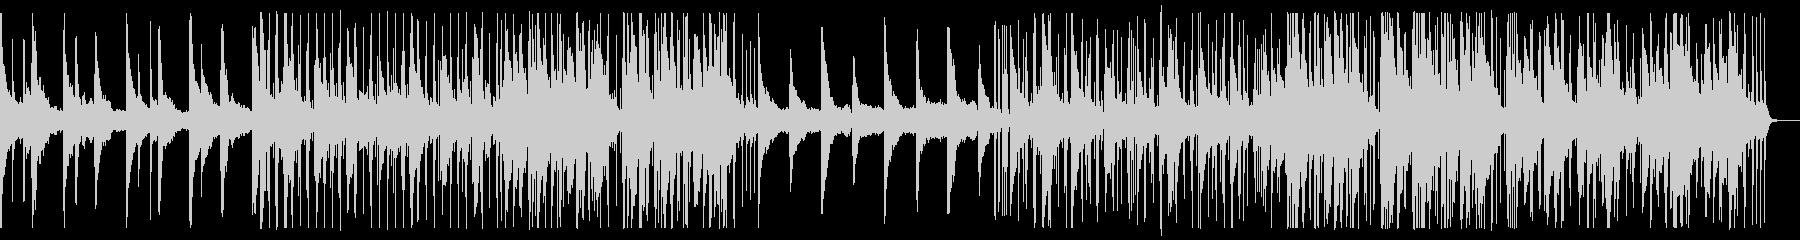 memory. R & B_2's unreproduced waveform